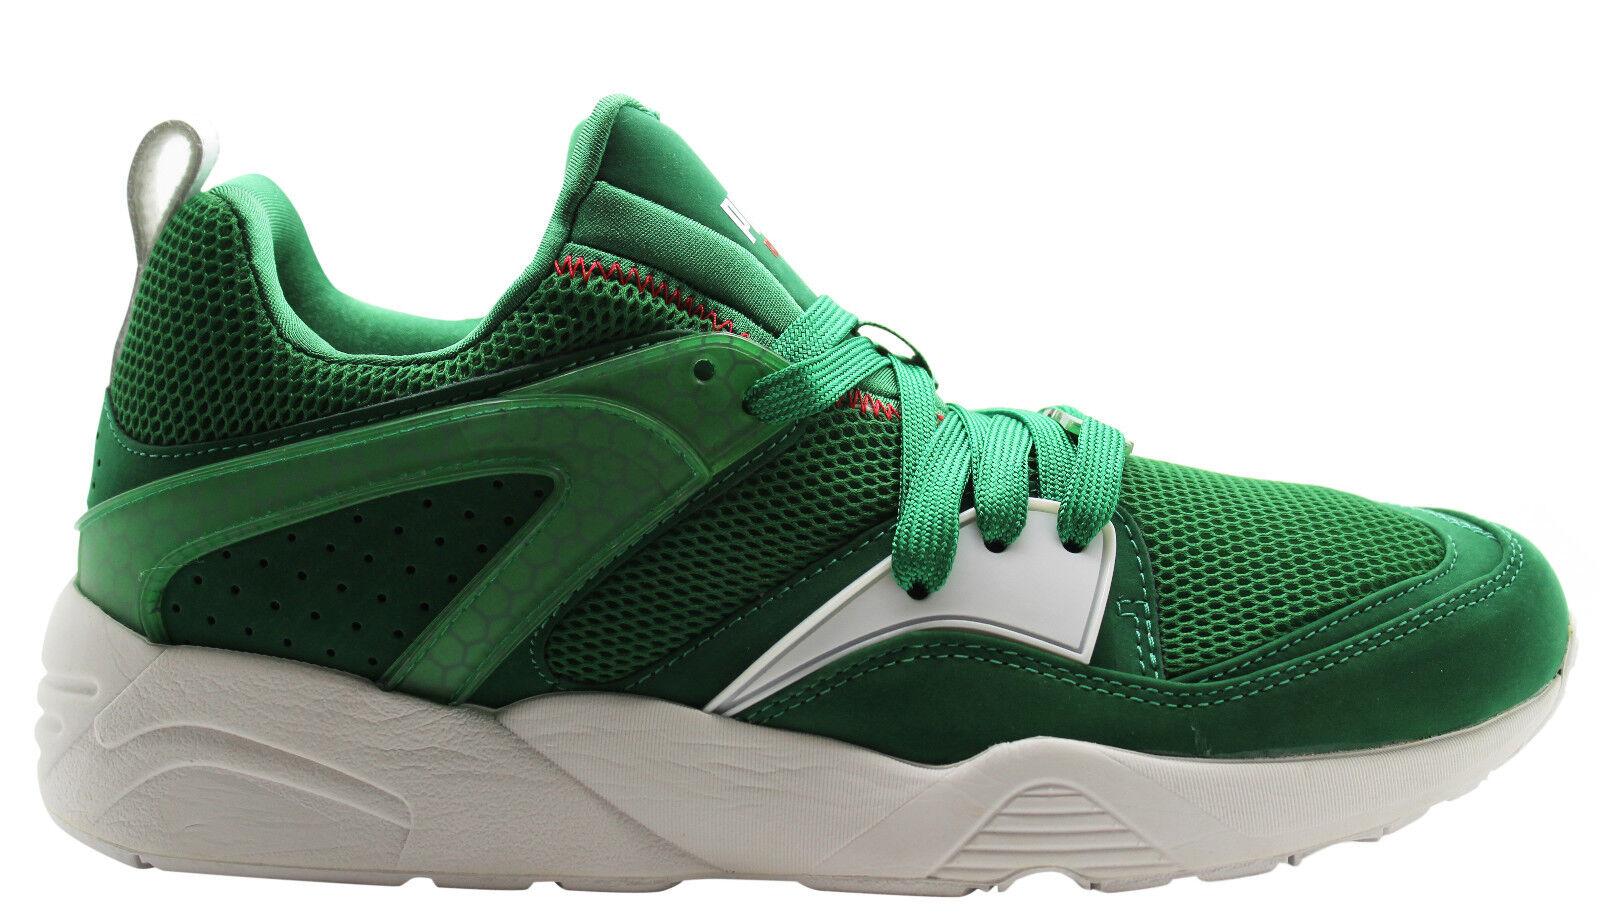 Puma Trinomic Blaze Of Glory X Green homme Trainers 358490 01 U18